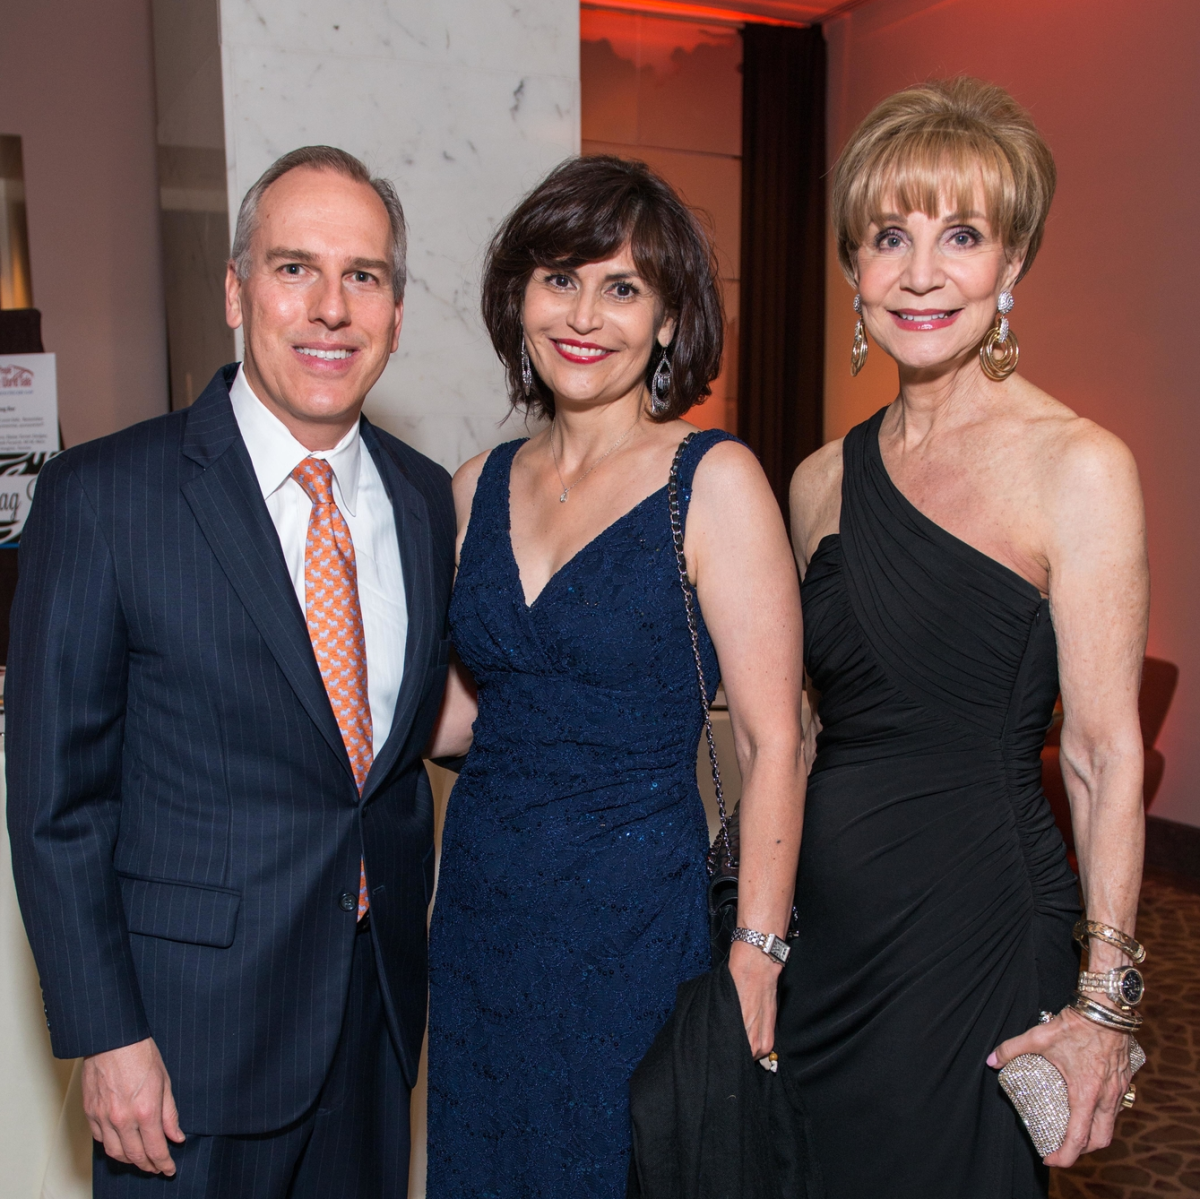 Medical Bridges 2015 Bob Sergeskitter, Denise Rhodes, Leisa Holland Nelson